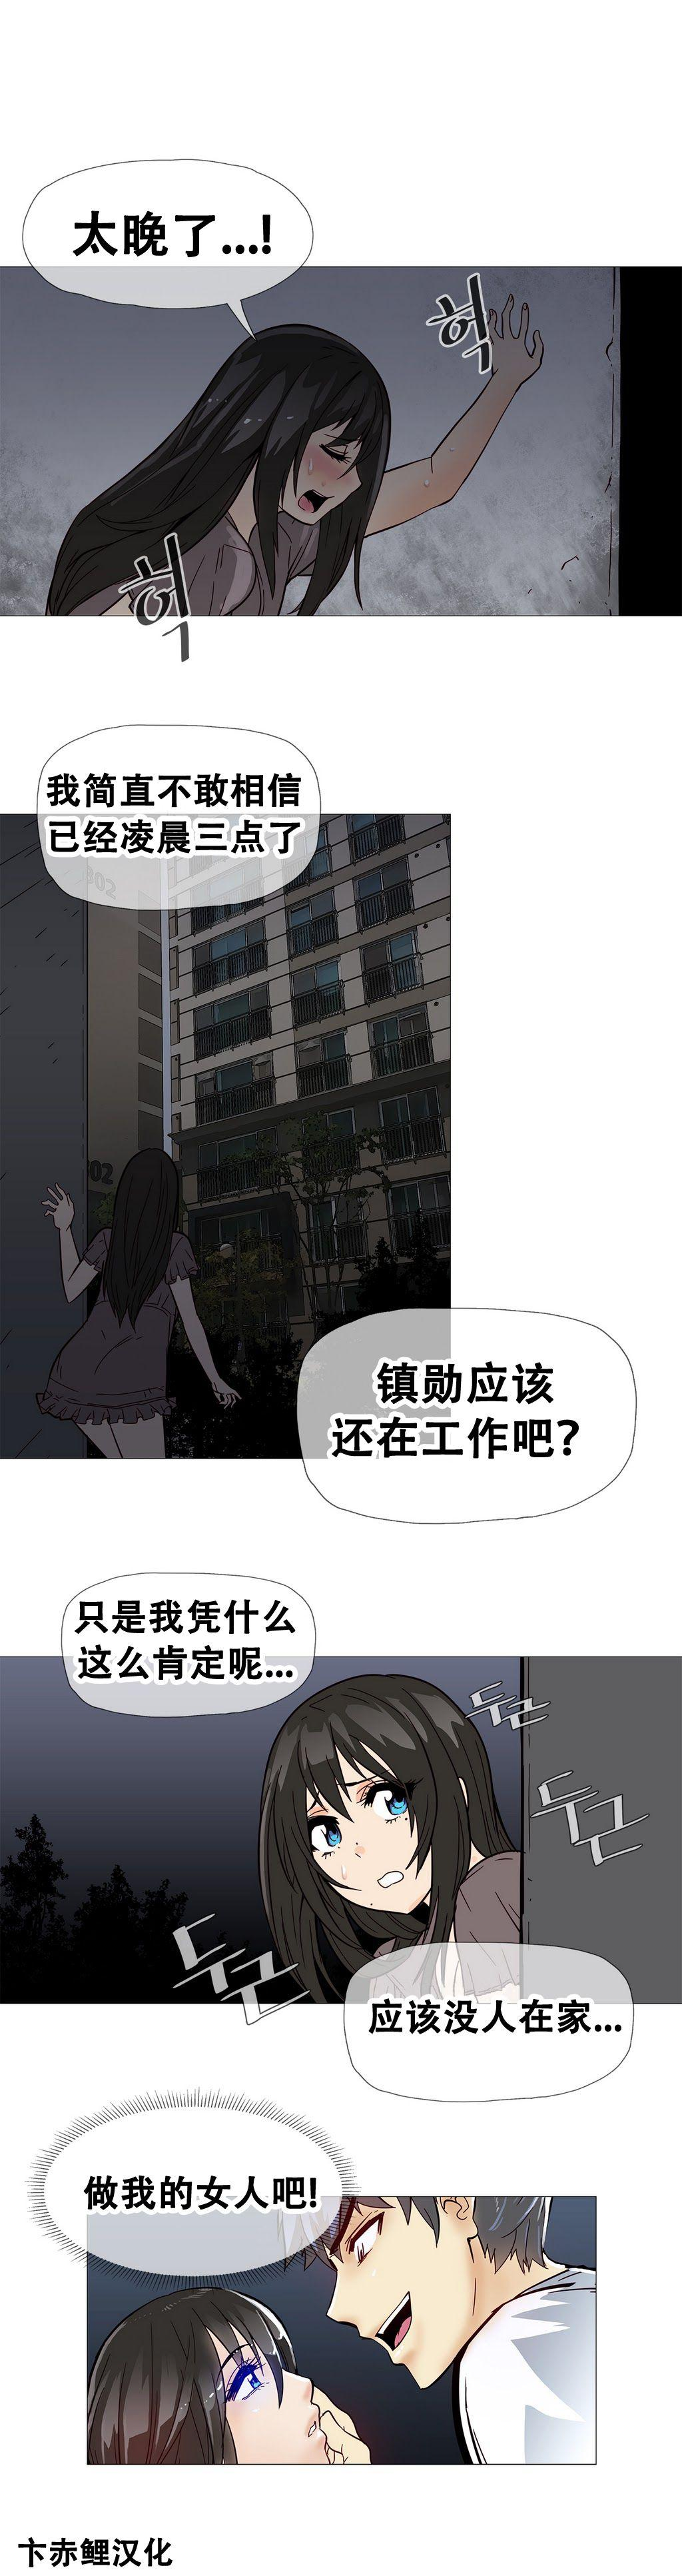 HouseHold Affairs 【卞赤鲤个人汉化】1~33话(持续更新中) 218